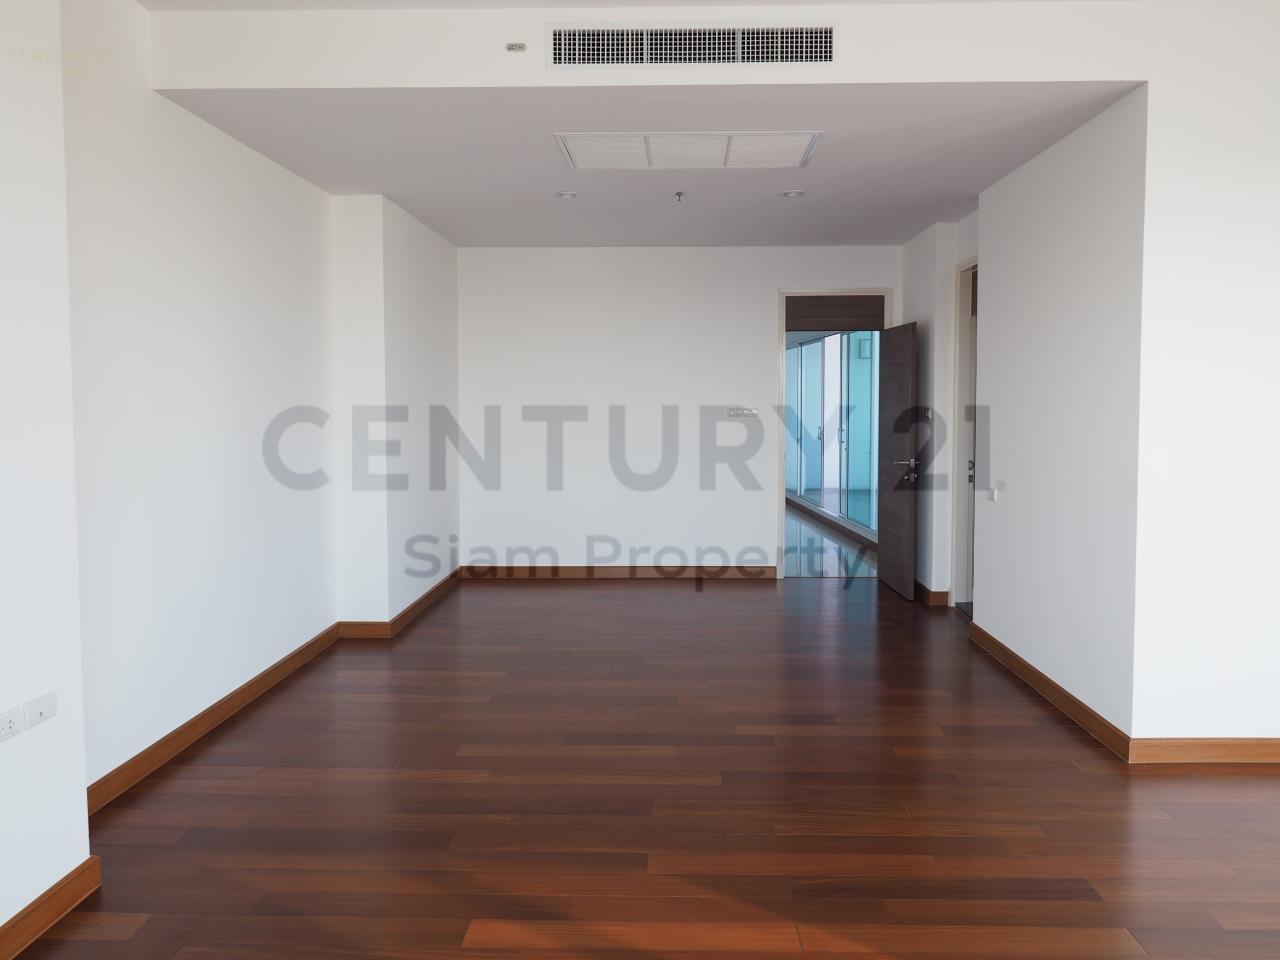 Century21 Siam Property Agency's Supalai Prima Riva 8